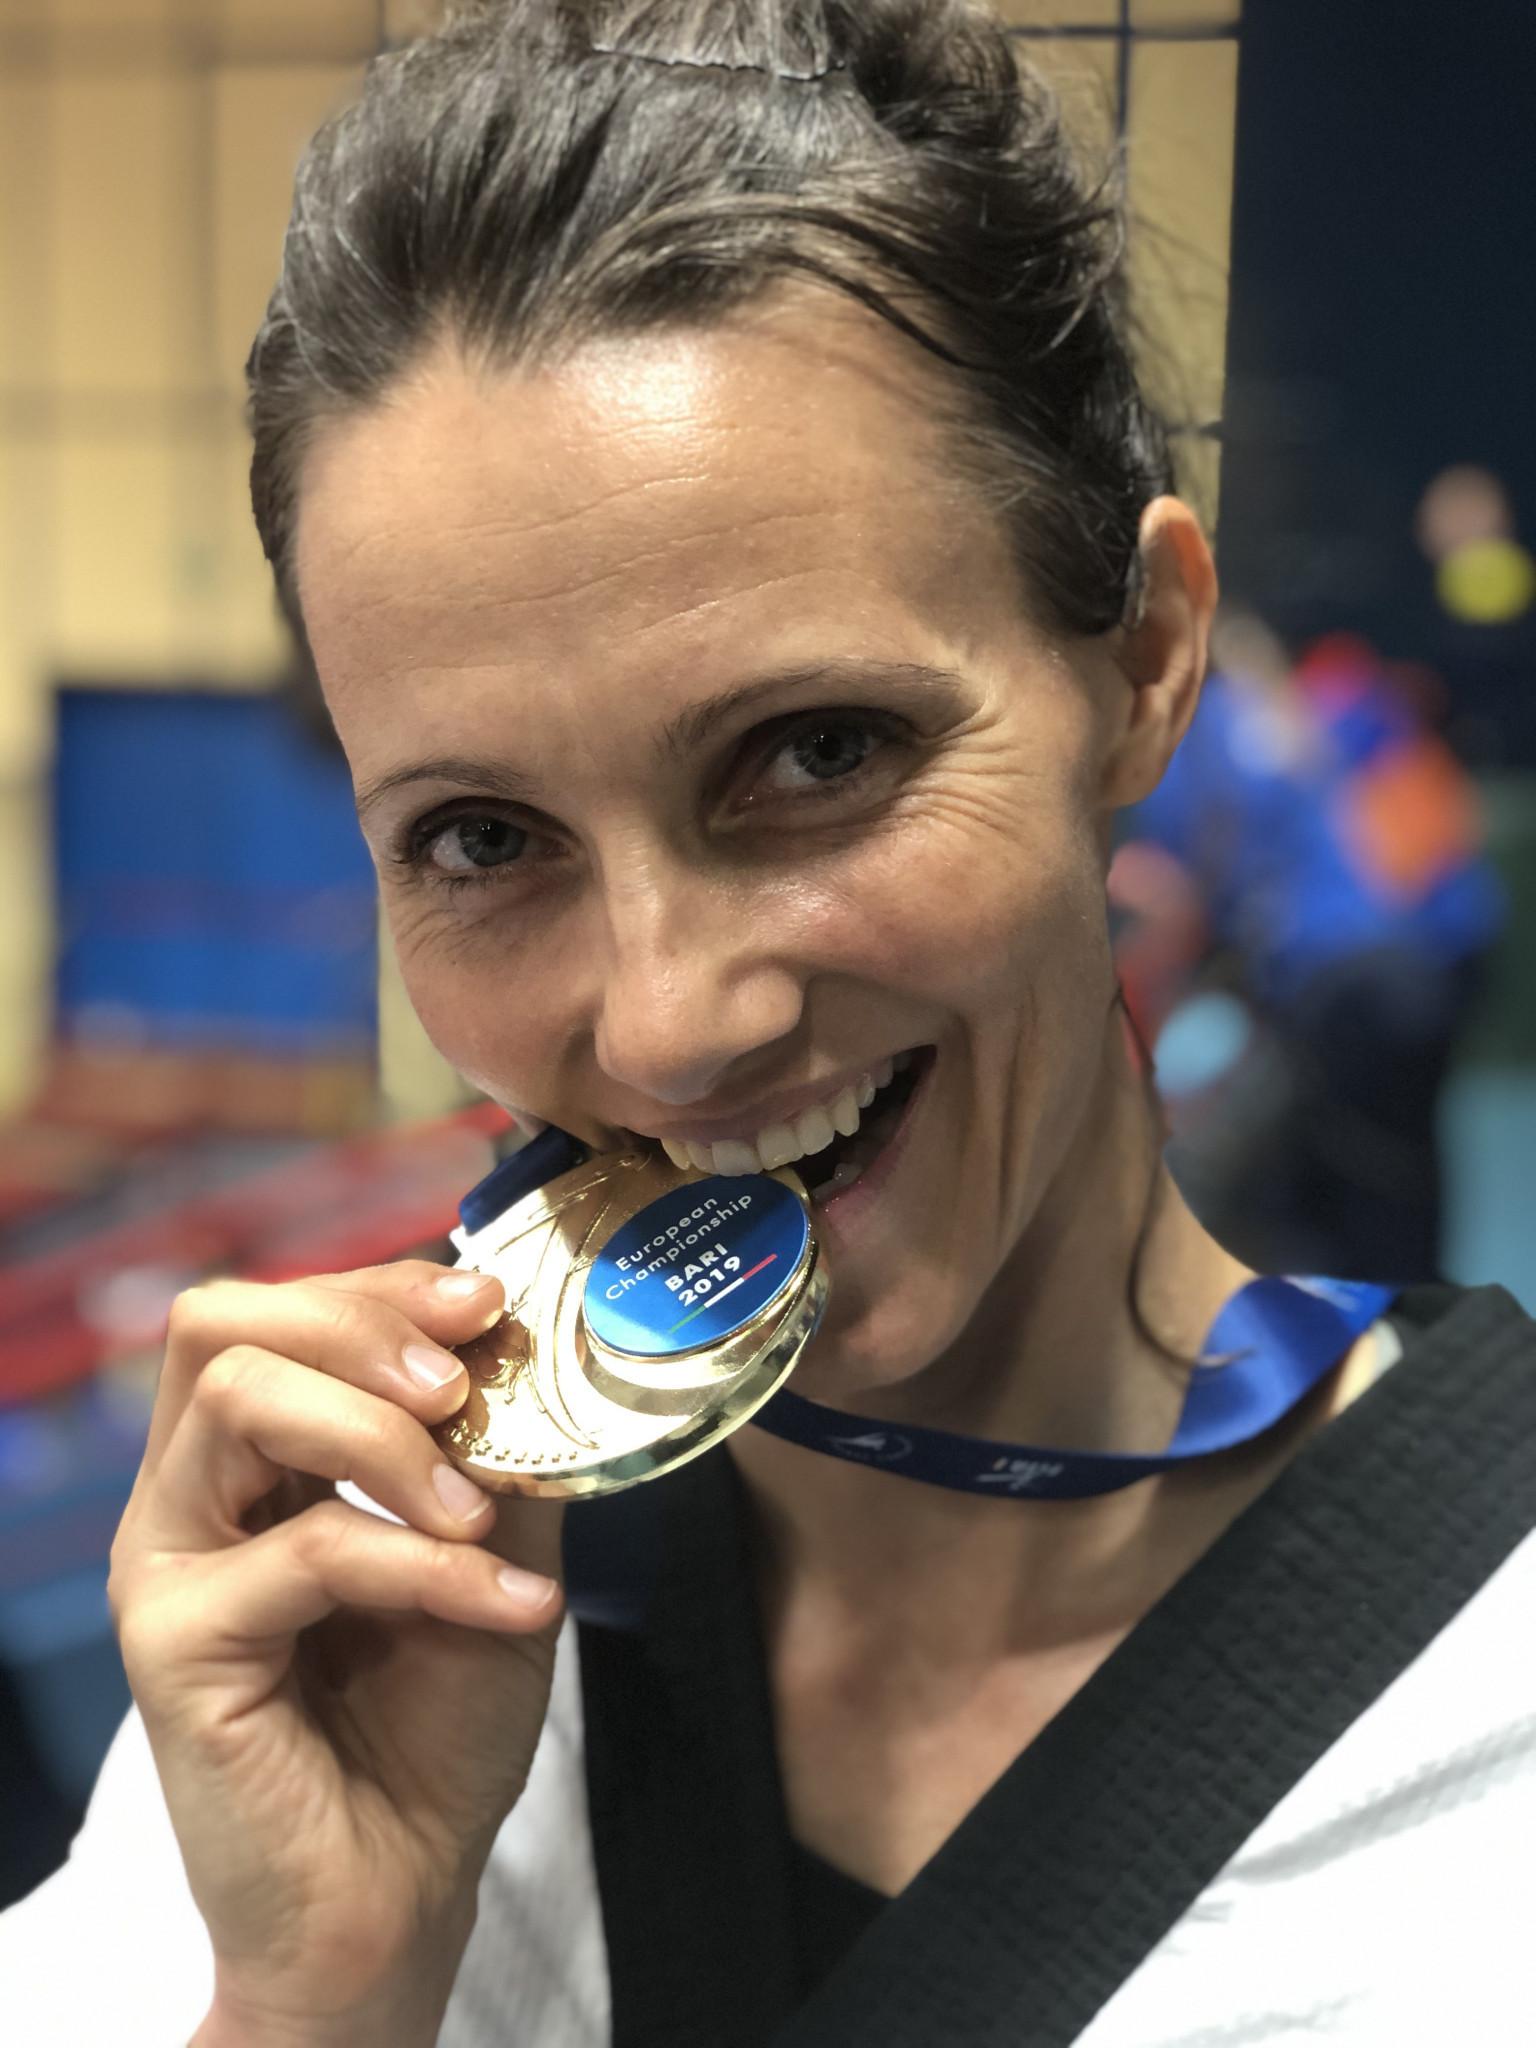 Danish Para-taekwondo player Gjessing tipped to succeed at Tokyo 2020